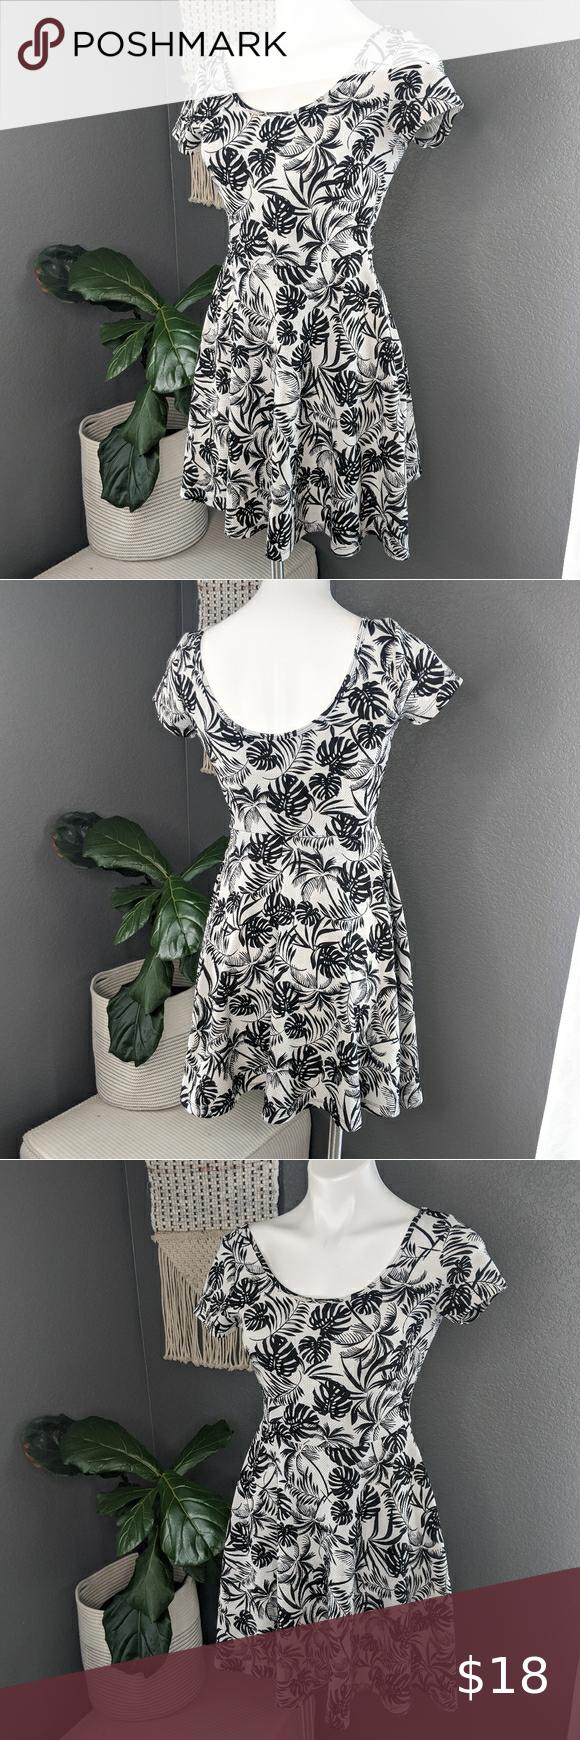 3 For 20 Palm Summer Dress Summer Dresses Dresses Clothes Design [ 1740 x 580 Pixel ]